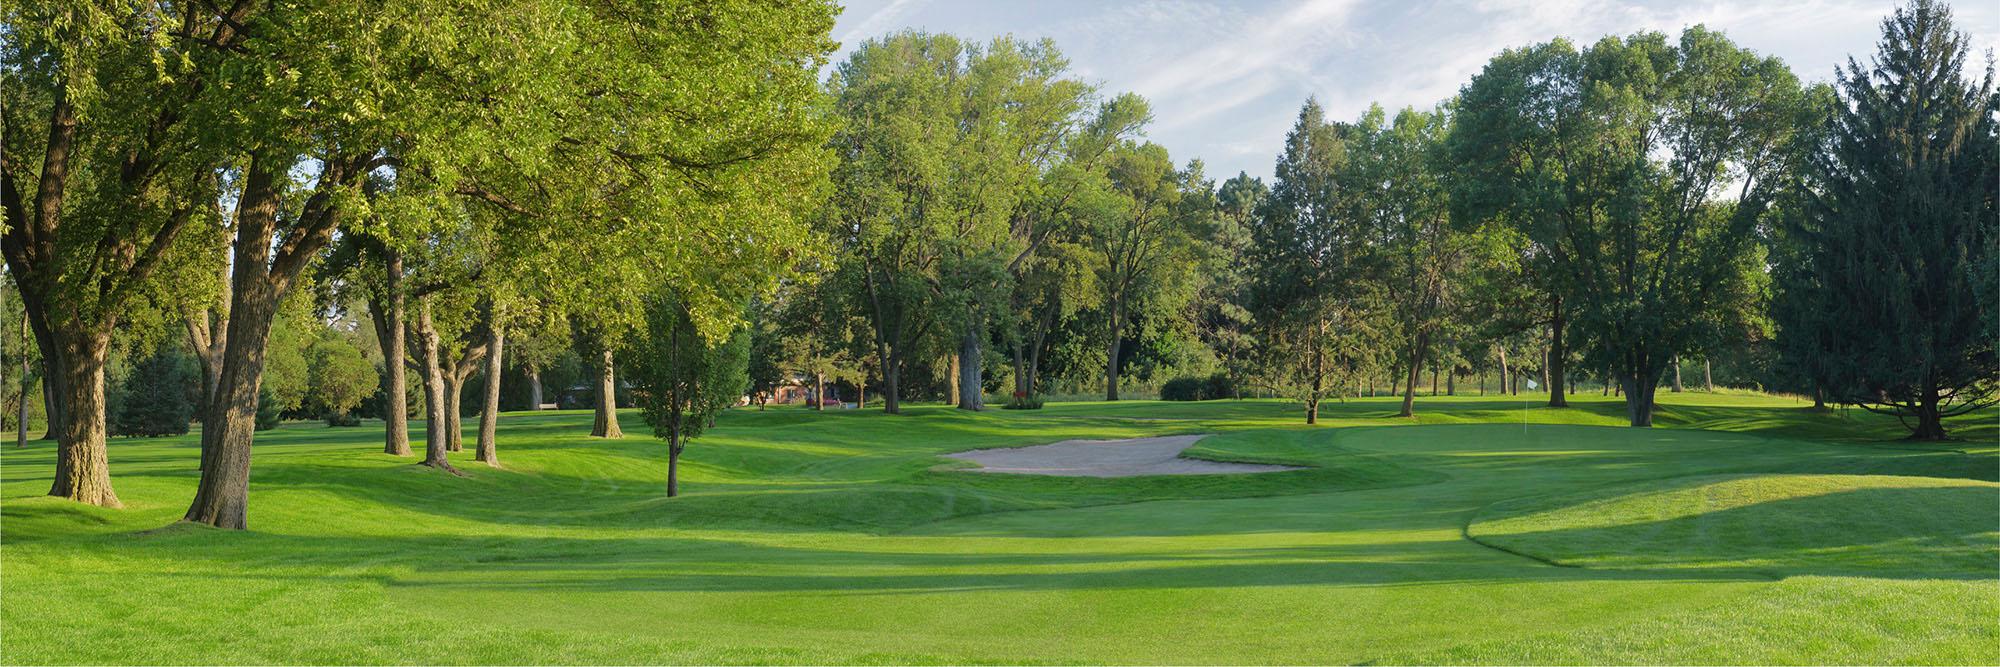 Golf Course Image - Fremont No. 4